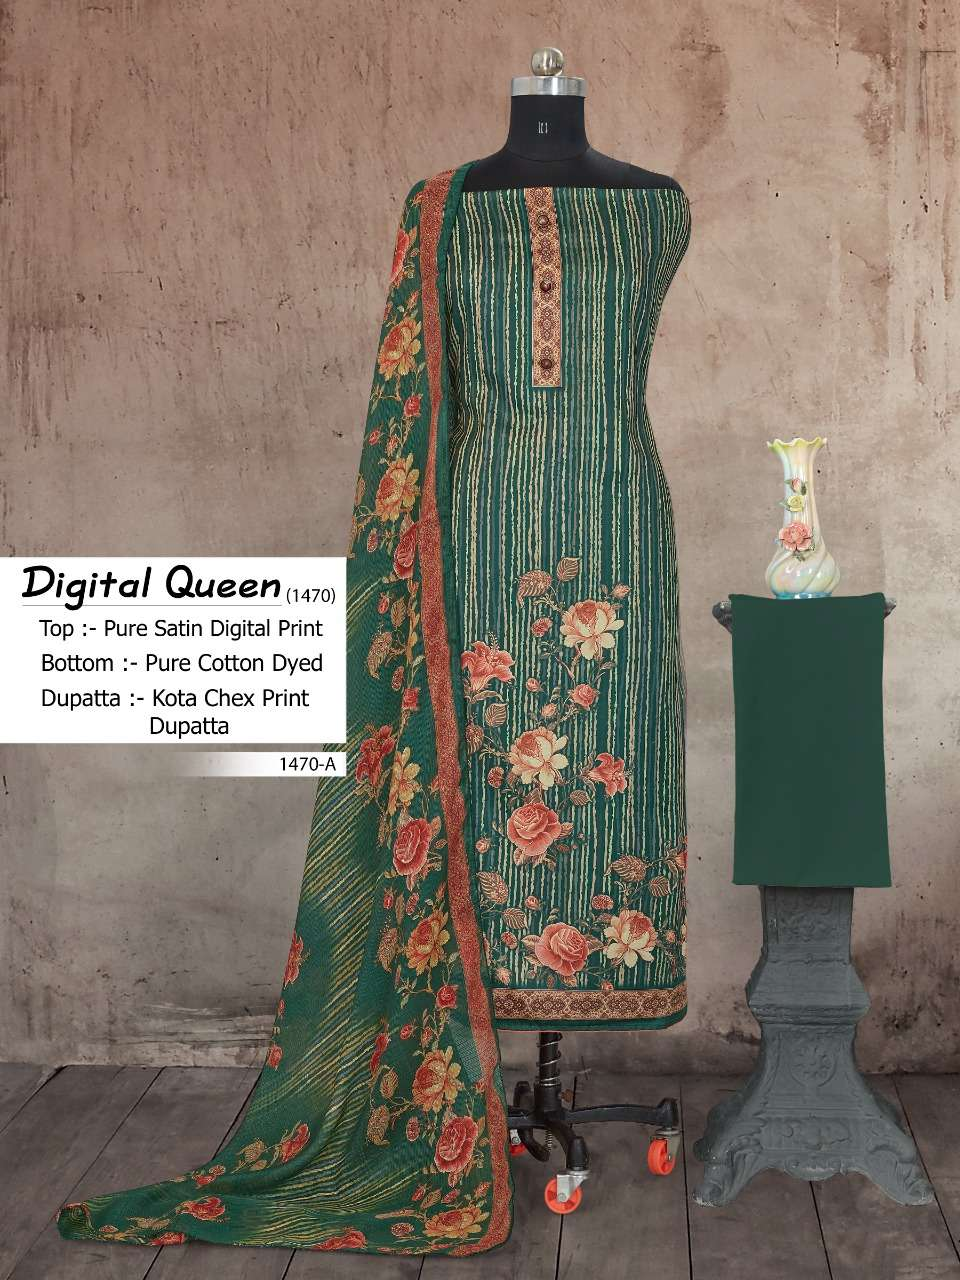 Bipson Digital Queen 1470 Cotton Satin Daily Wear Dresses